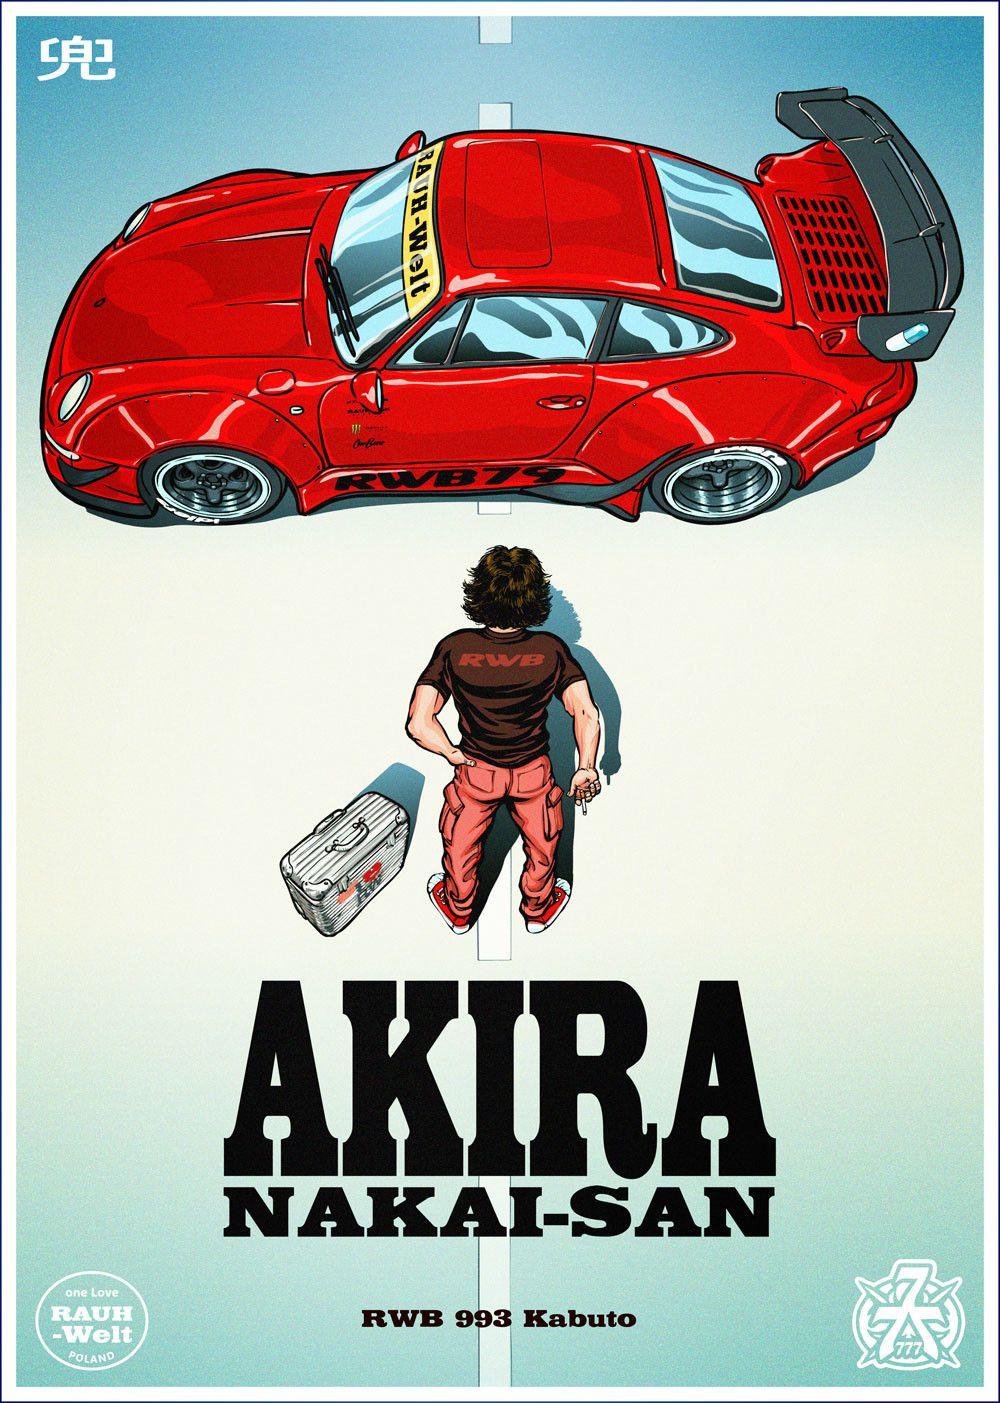 Artstation Akira Poster With Akira Nakai San Rwb 993 Kabuto